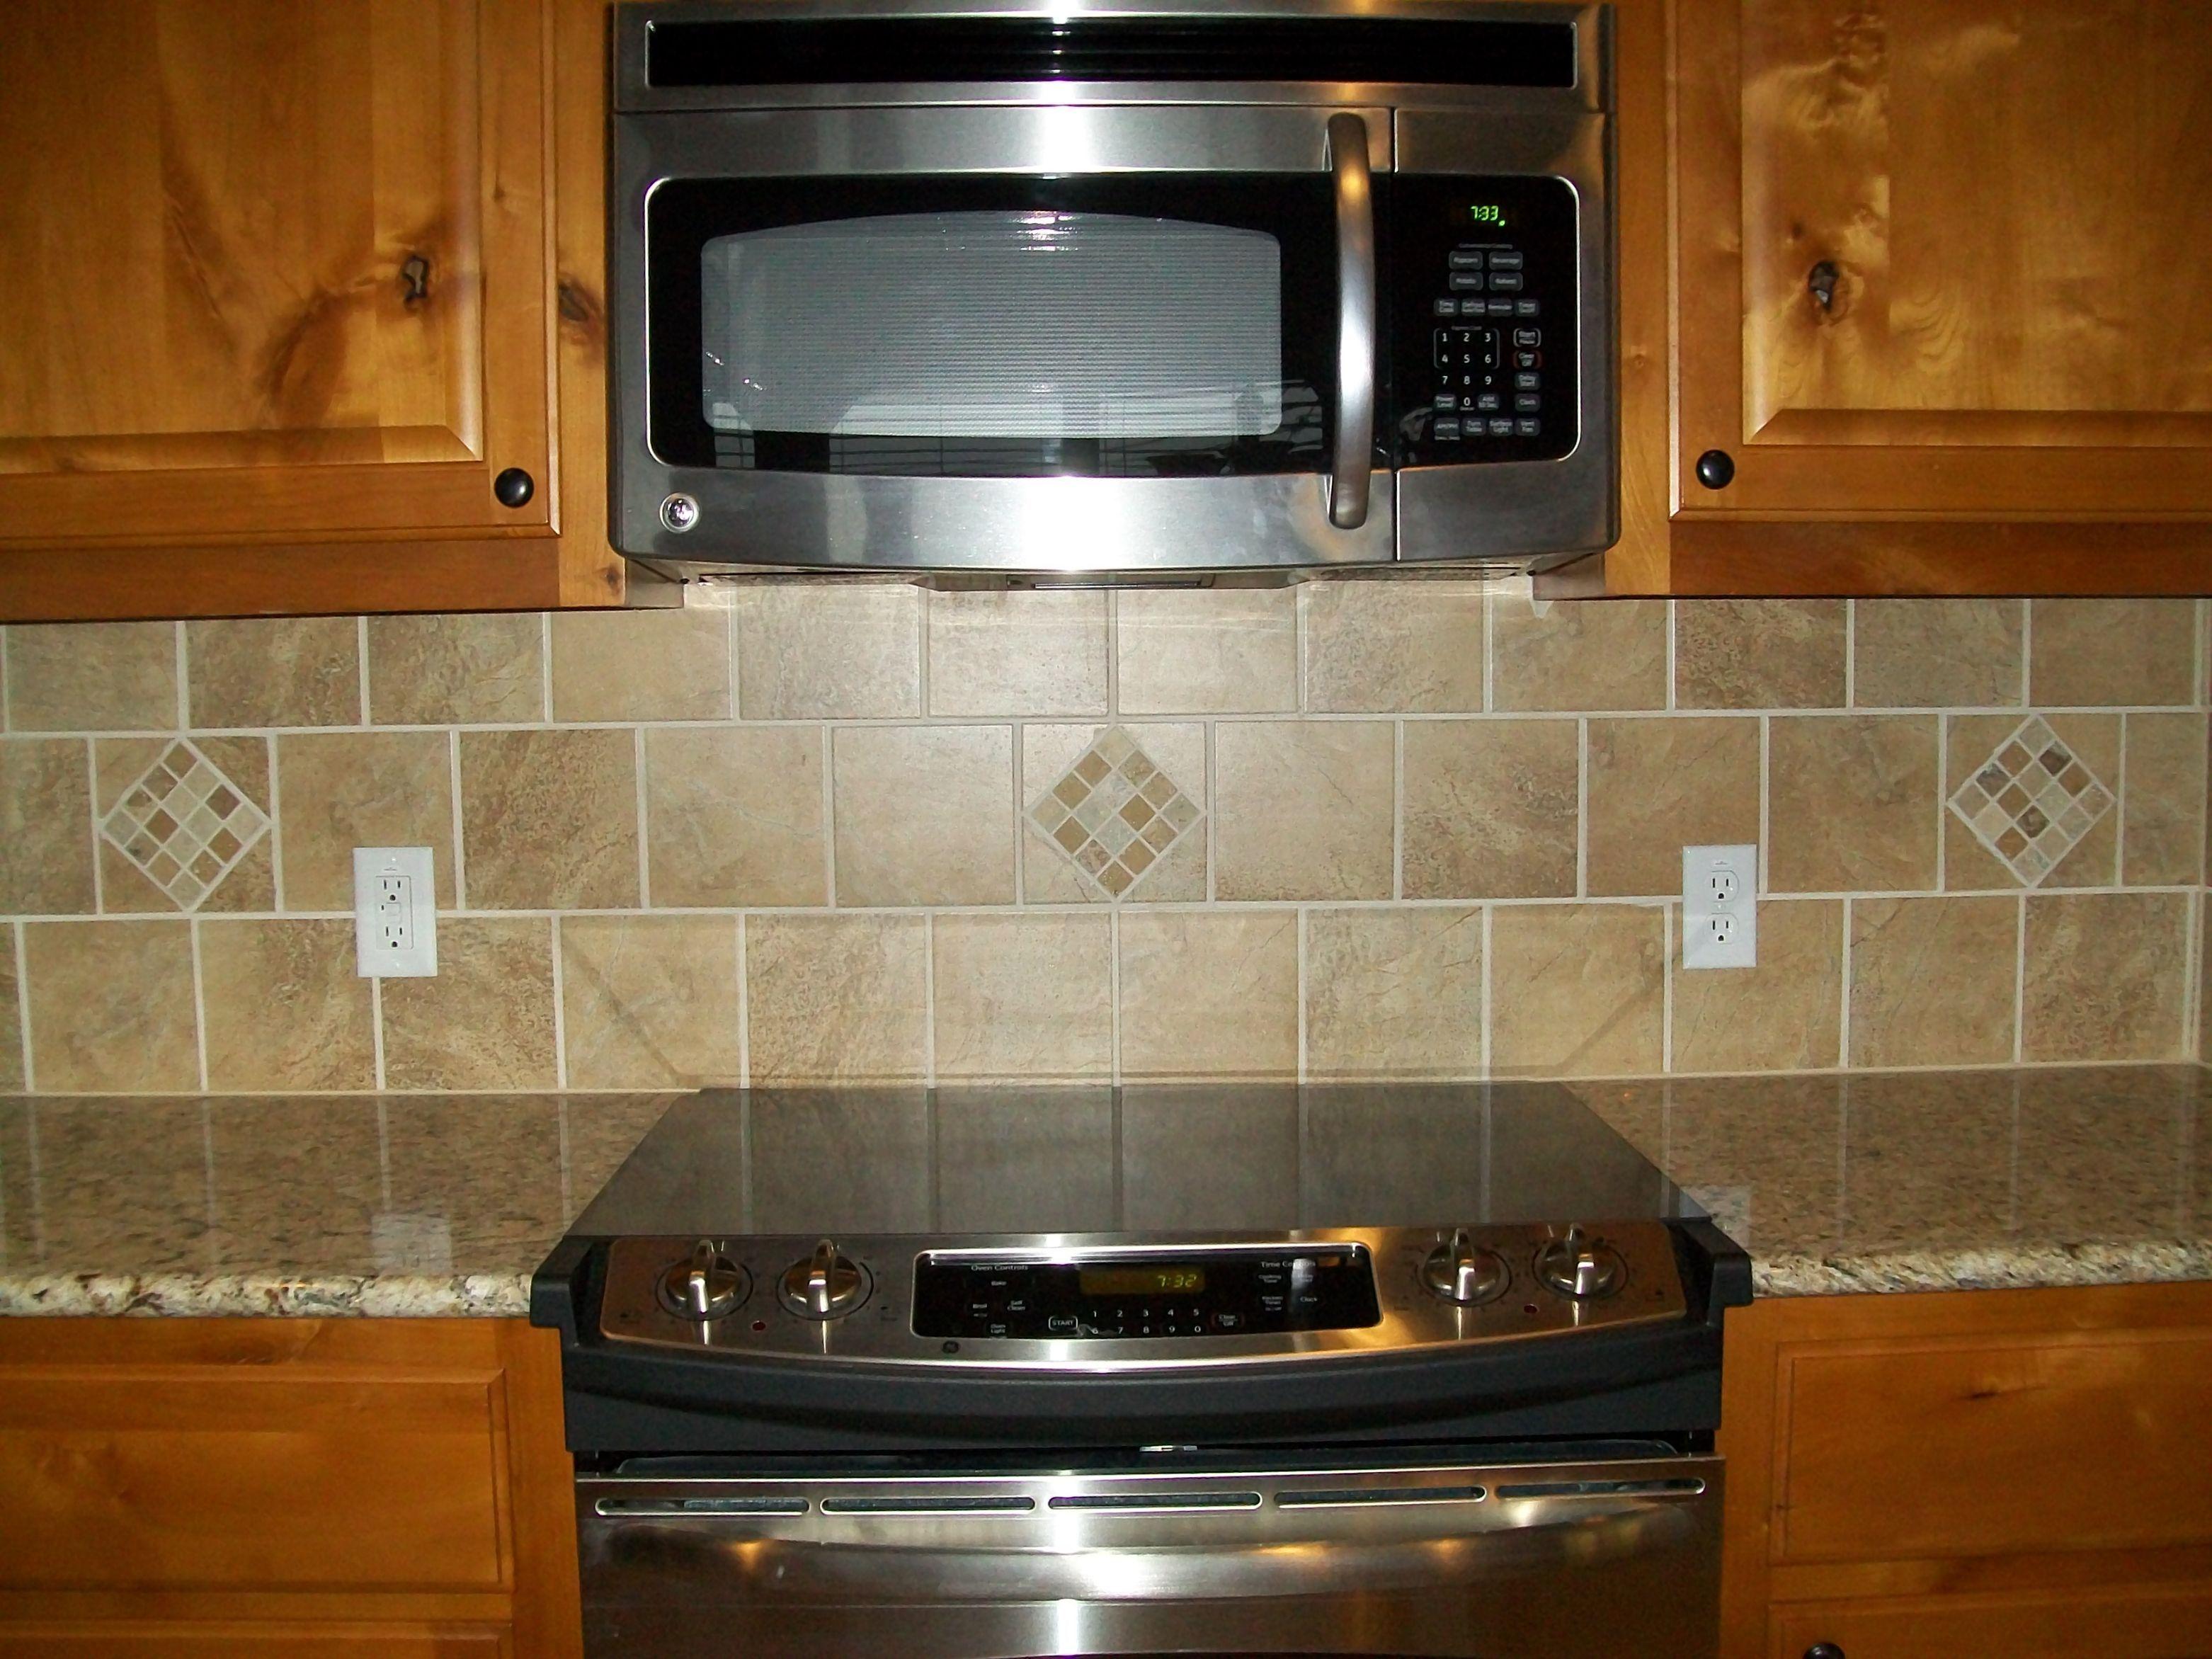 Kitchen Backsplash Neutral kitchen : traditional kitchen backsplash design ideas subway tile